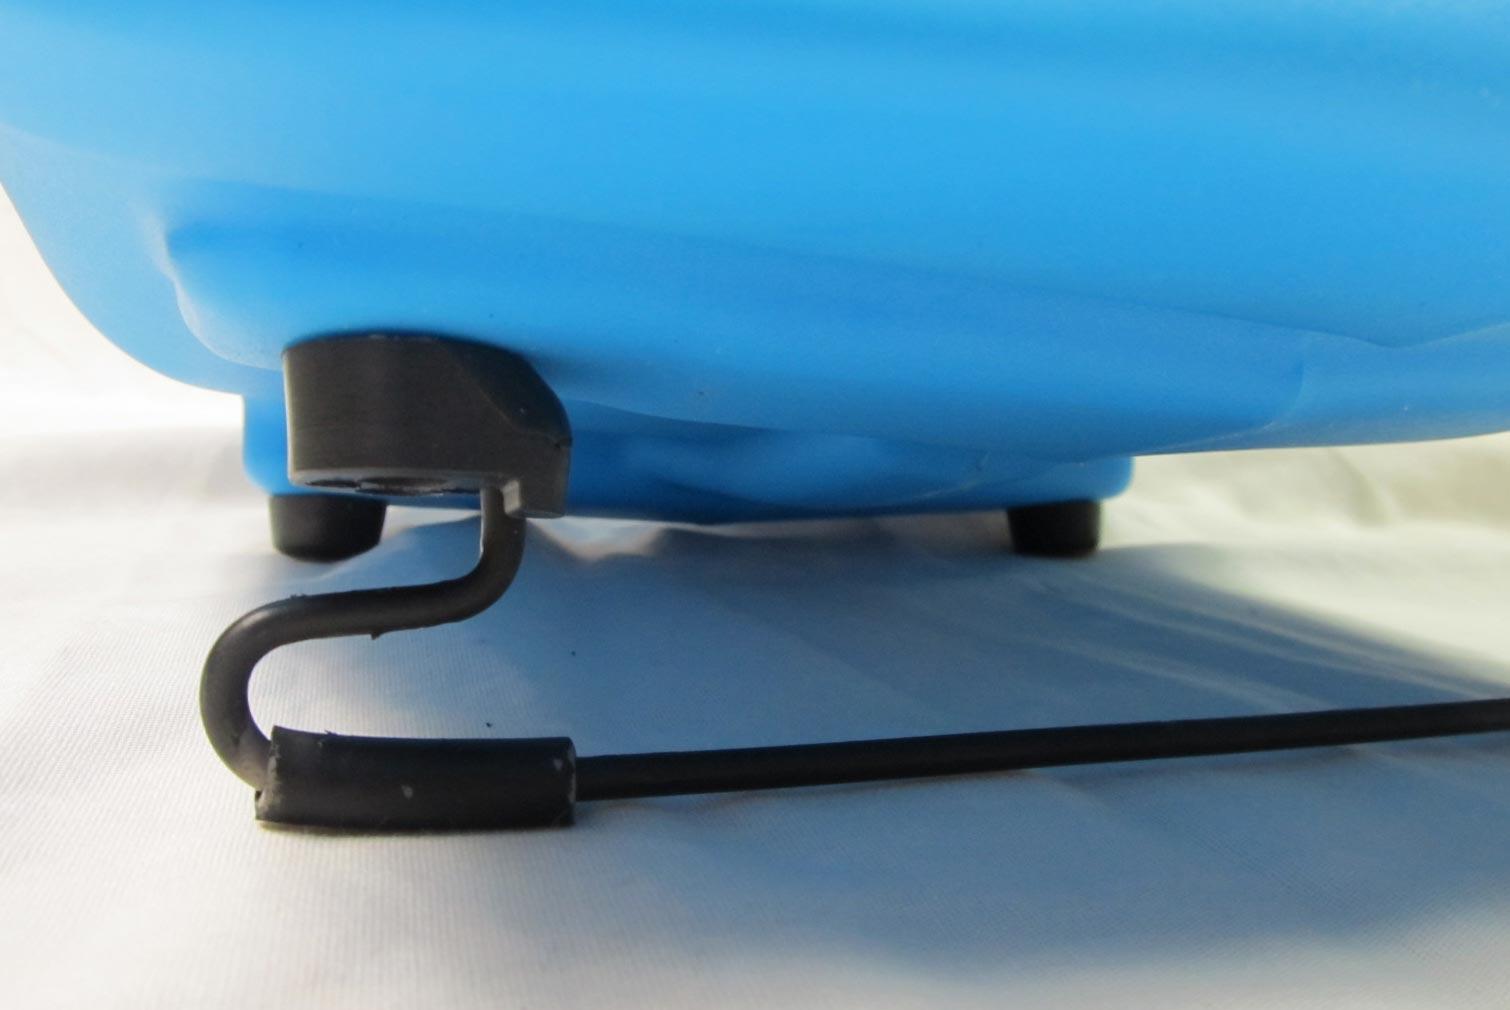 mini air mover kick stand